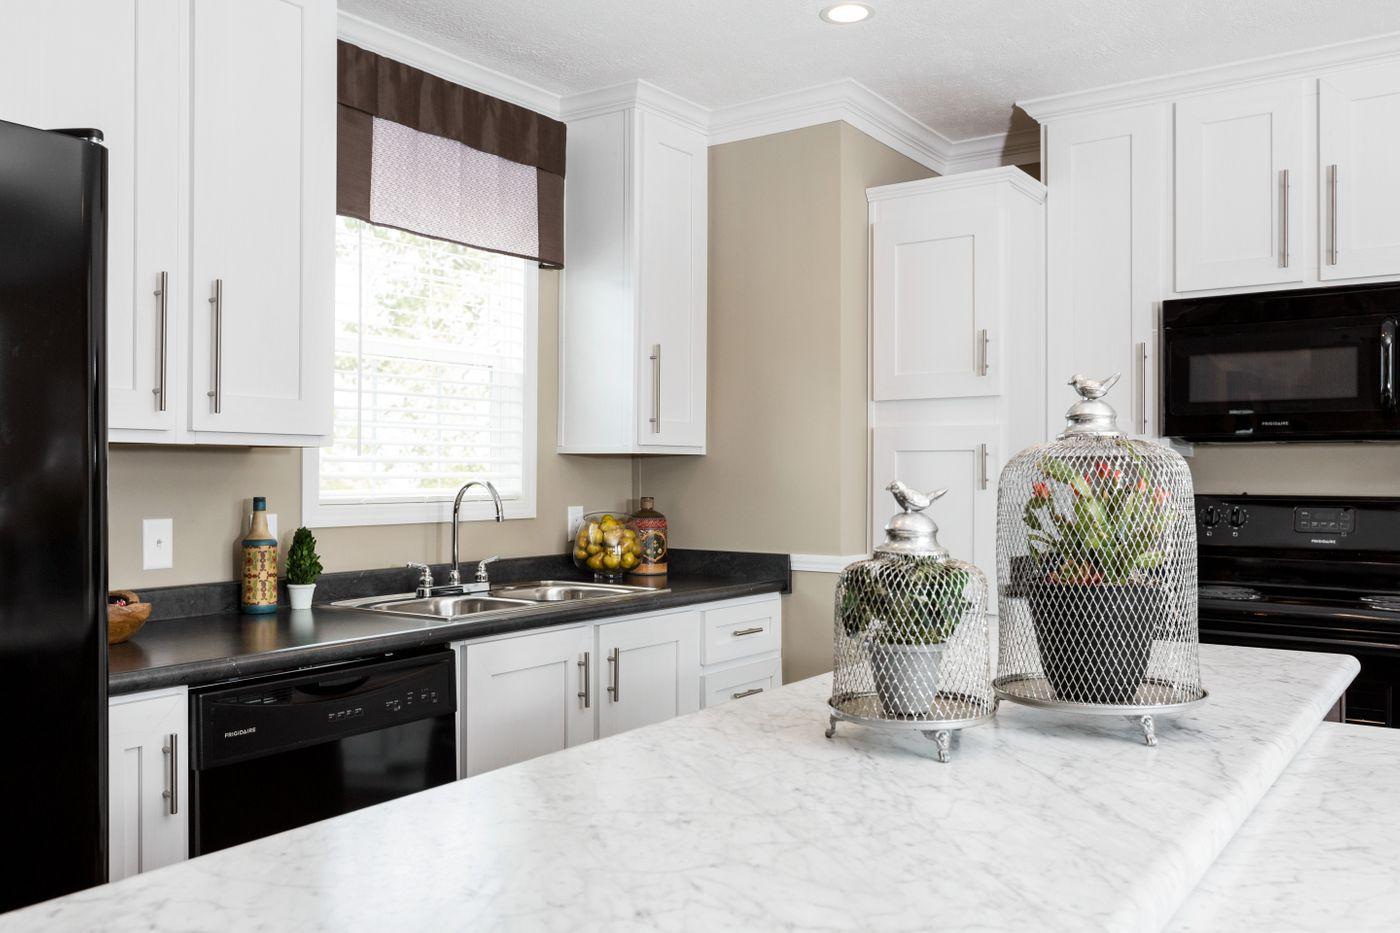 Denham Springs Housing in Denham Springs, LA - Manufactured Home and on